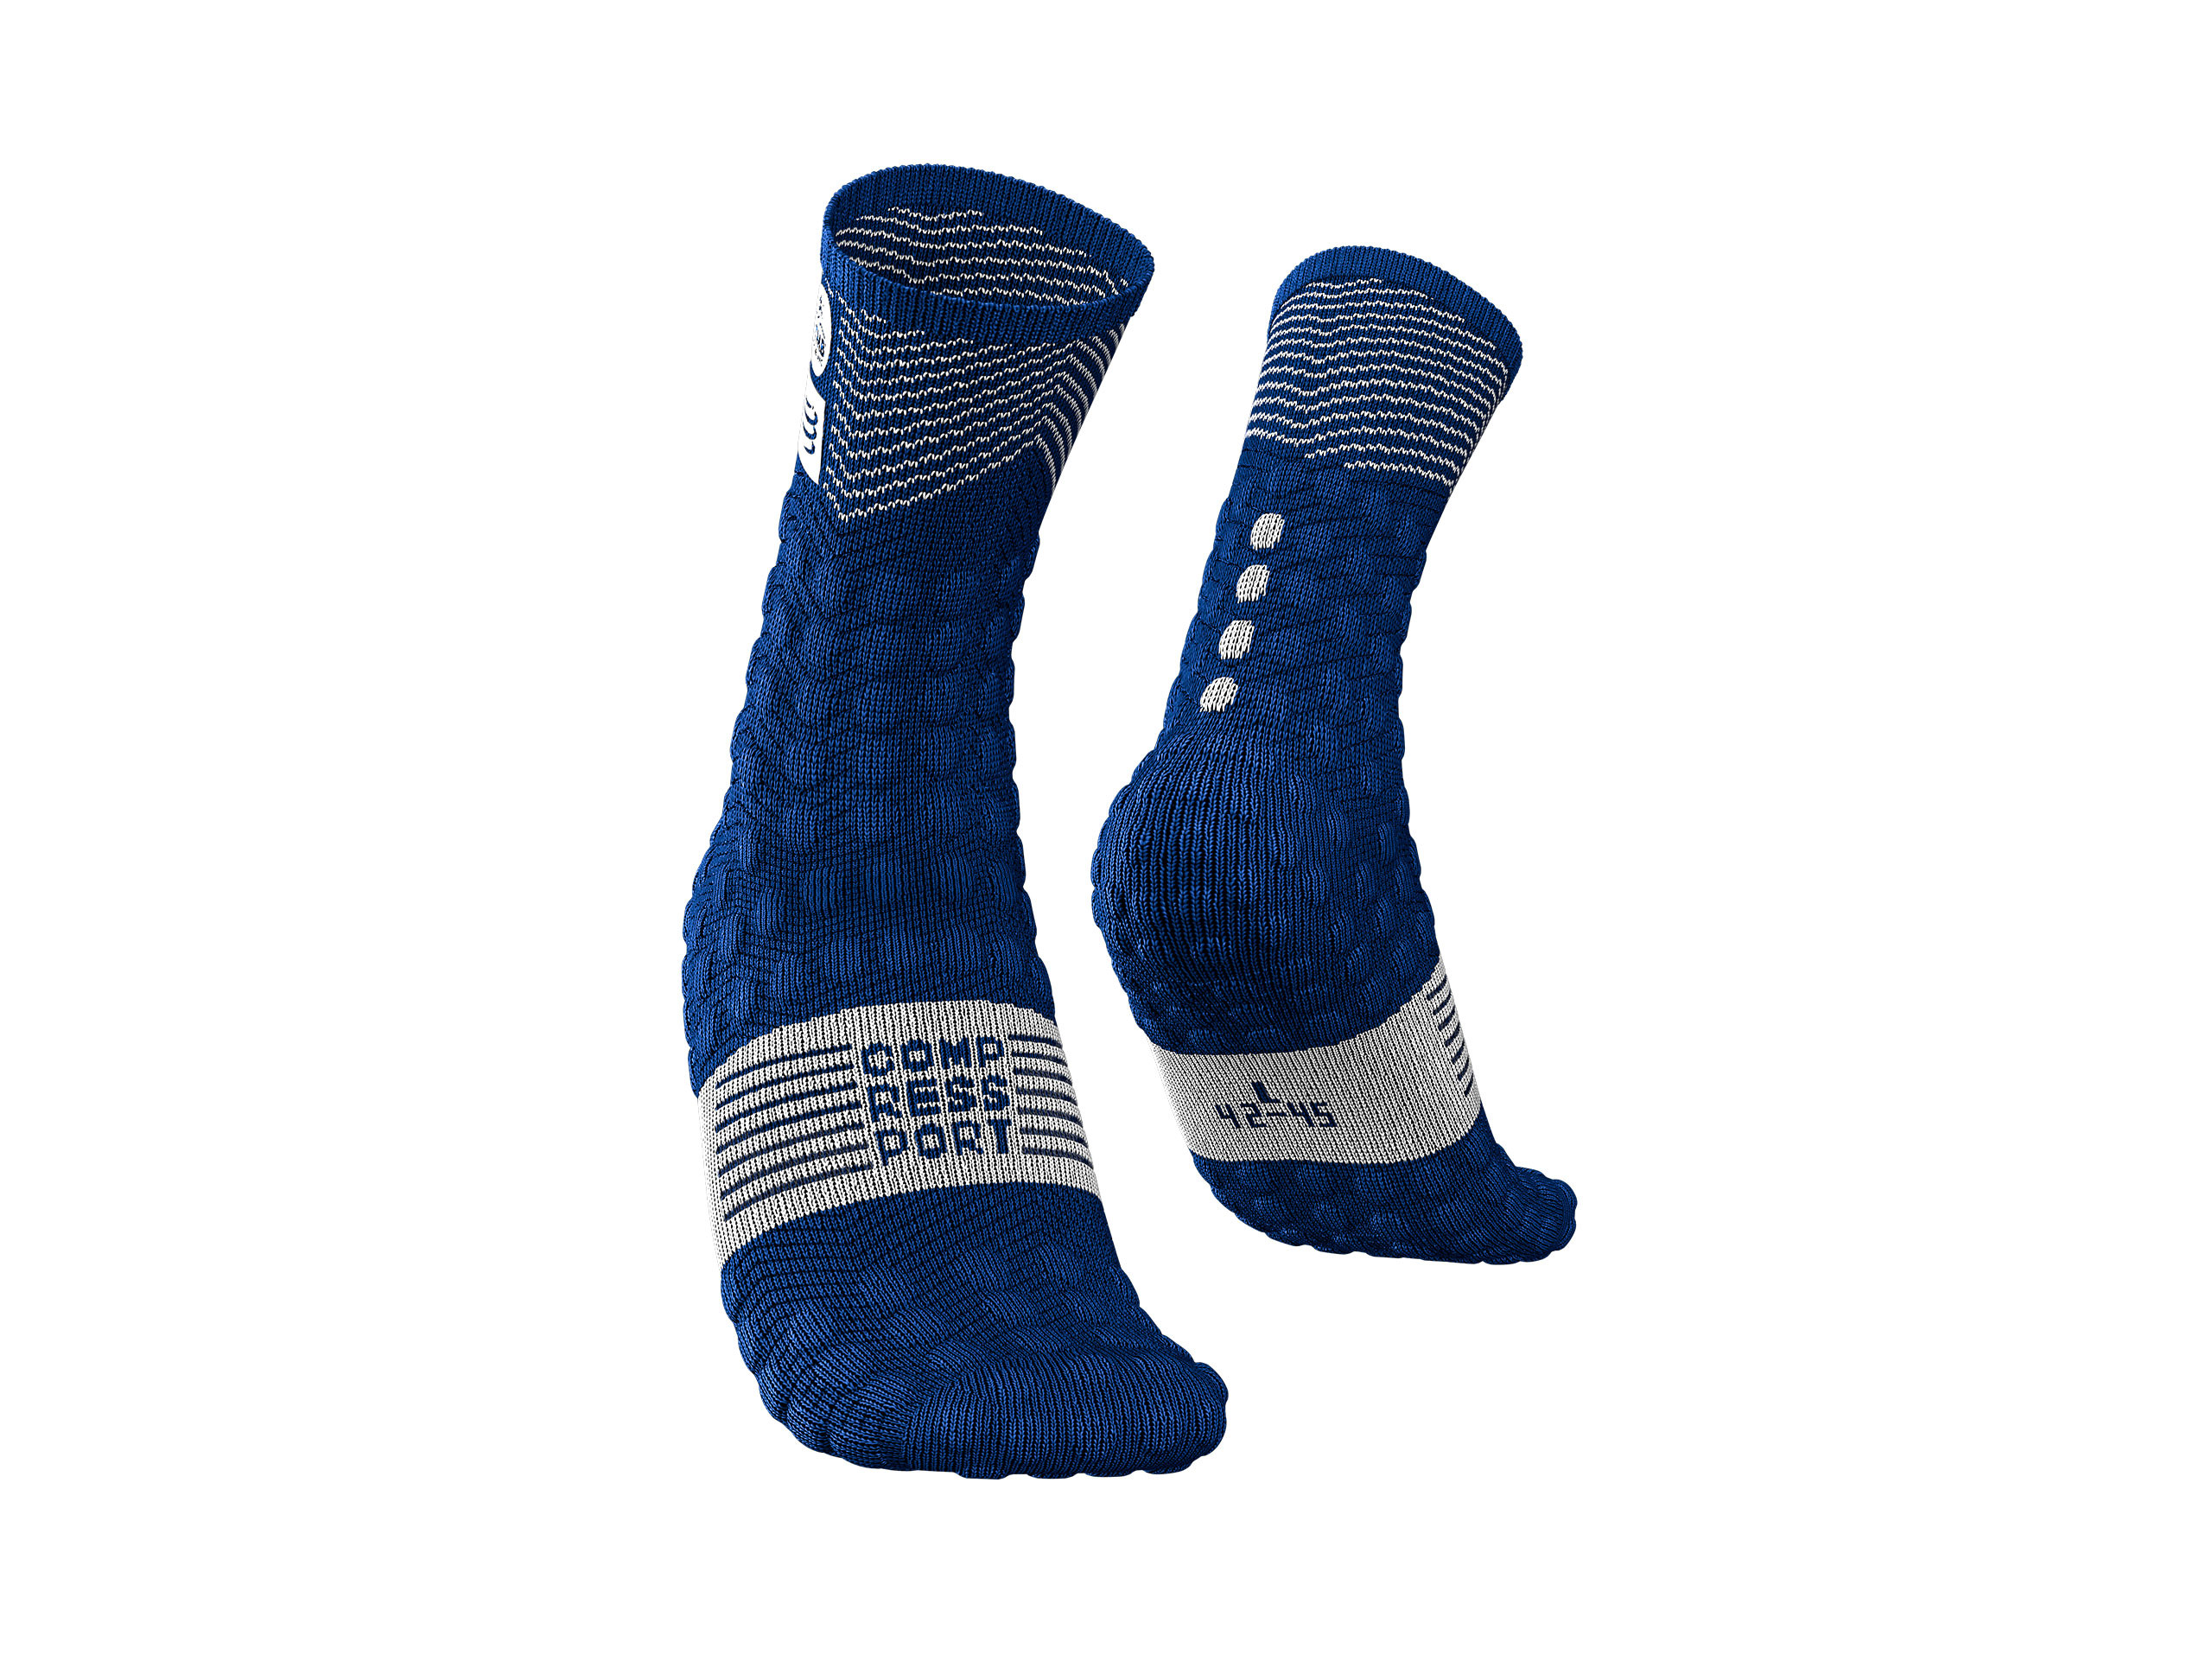 Calcetines deportivos Pro v3.0 Ultra-Trail - UTMB® 2019